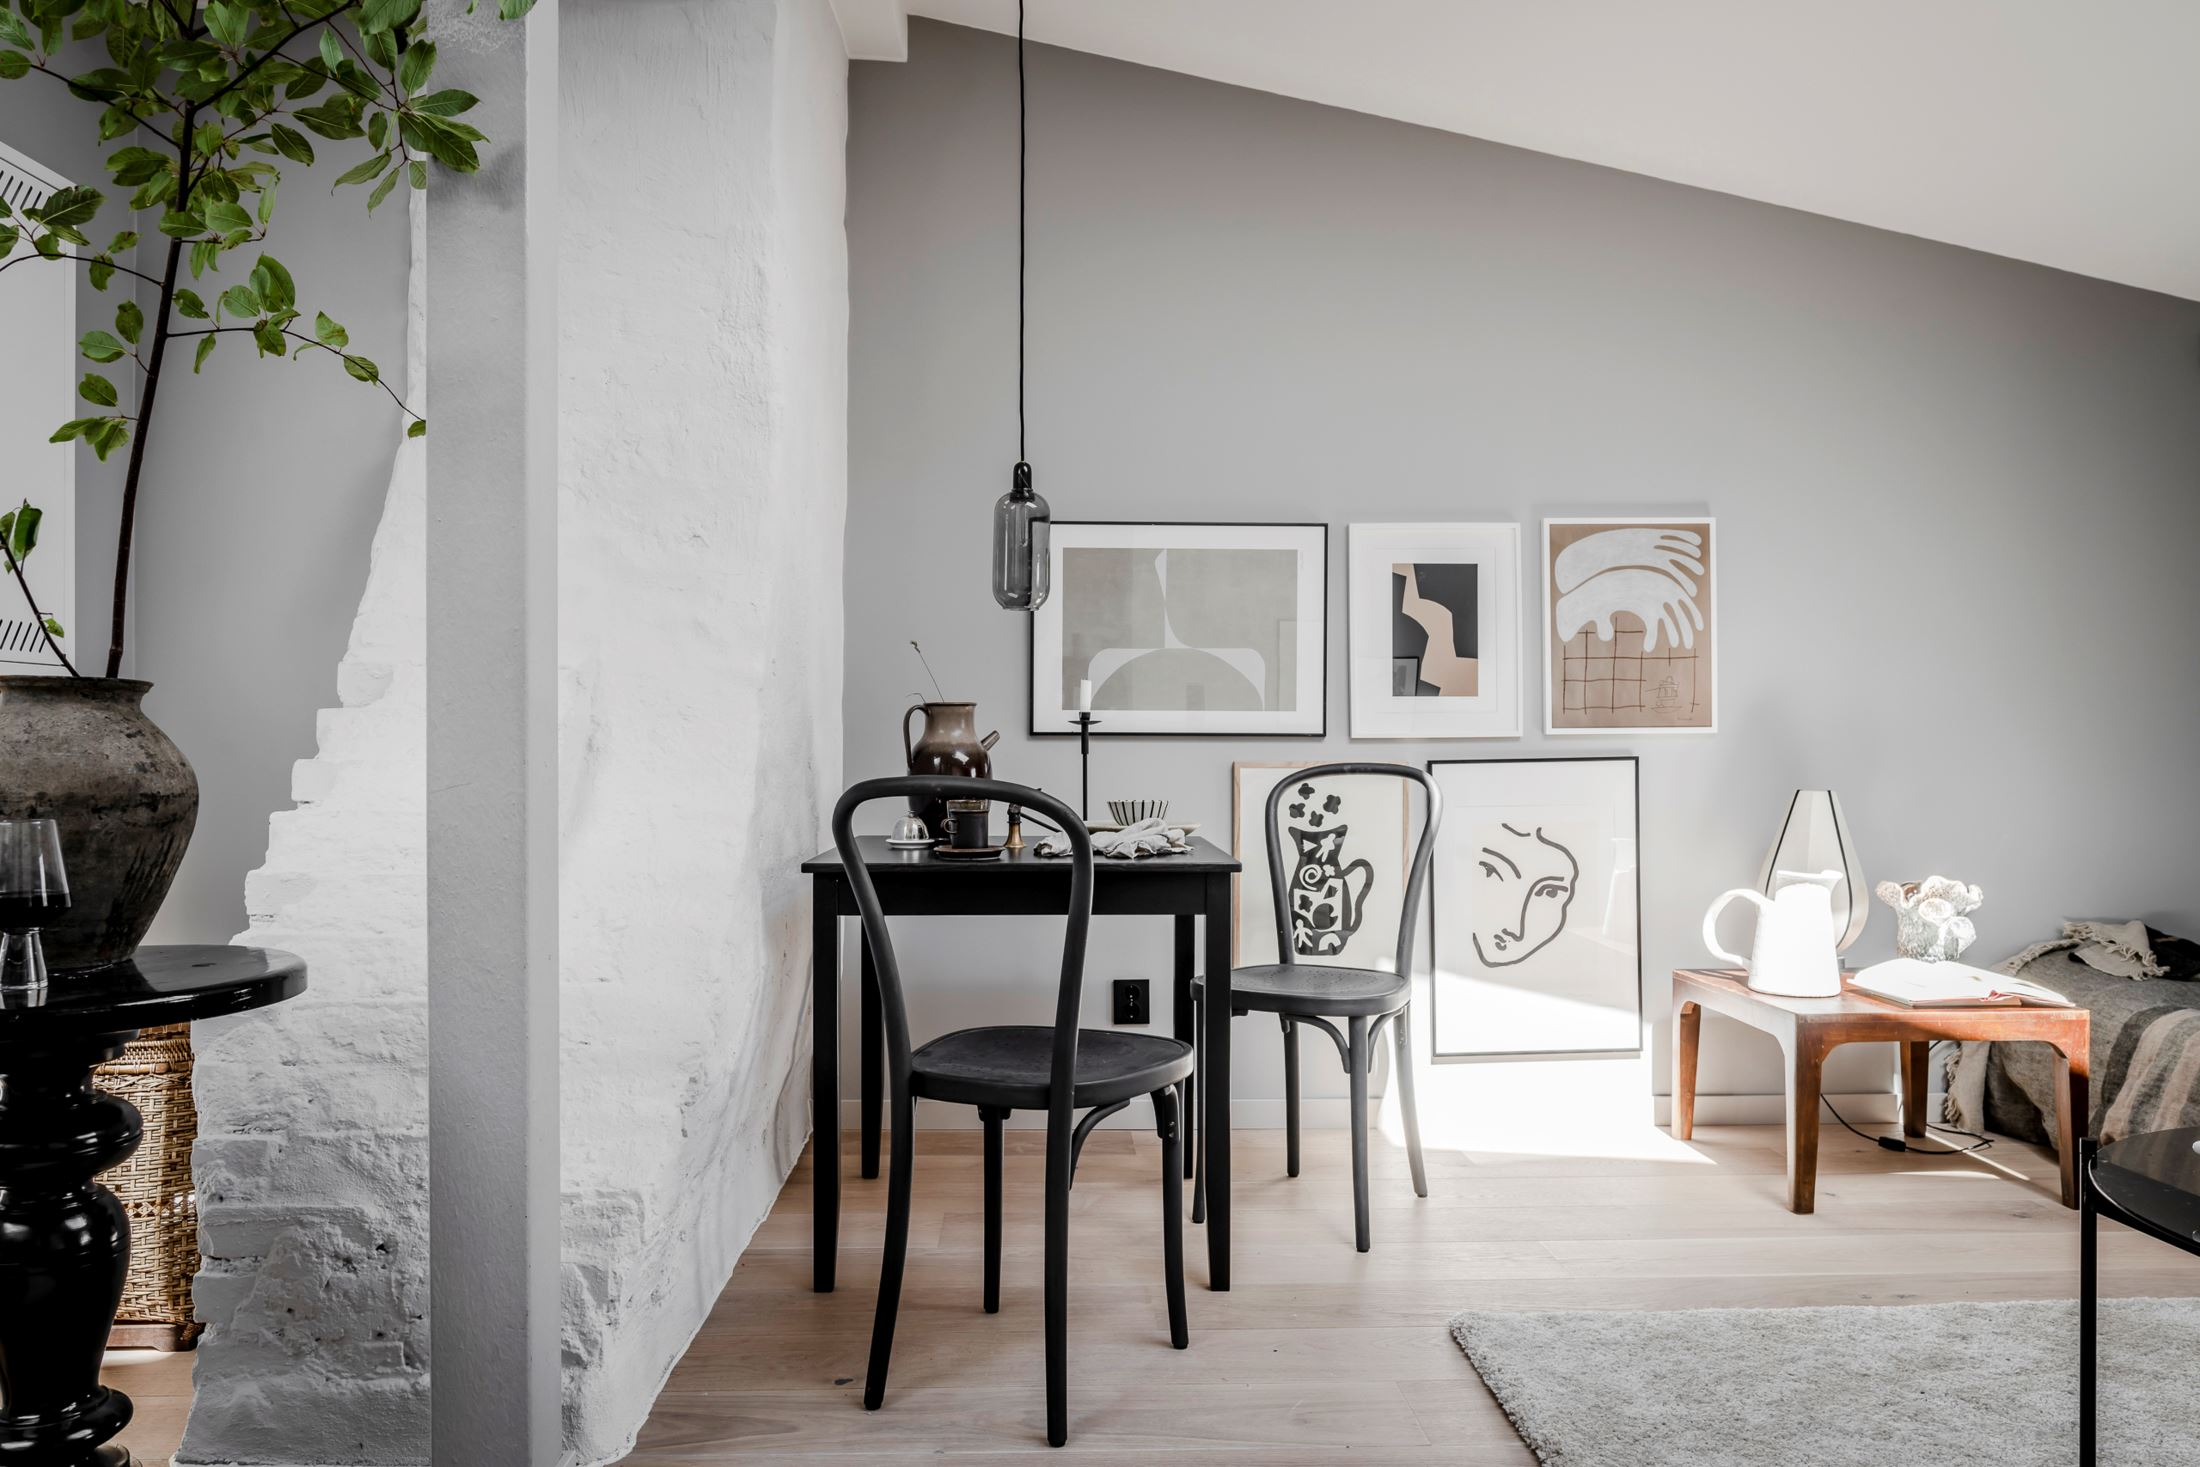 Plan deschis și decor nordic într o garsonieră la mansardă 35 m² 18